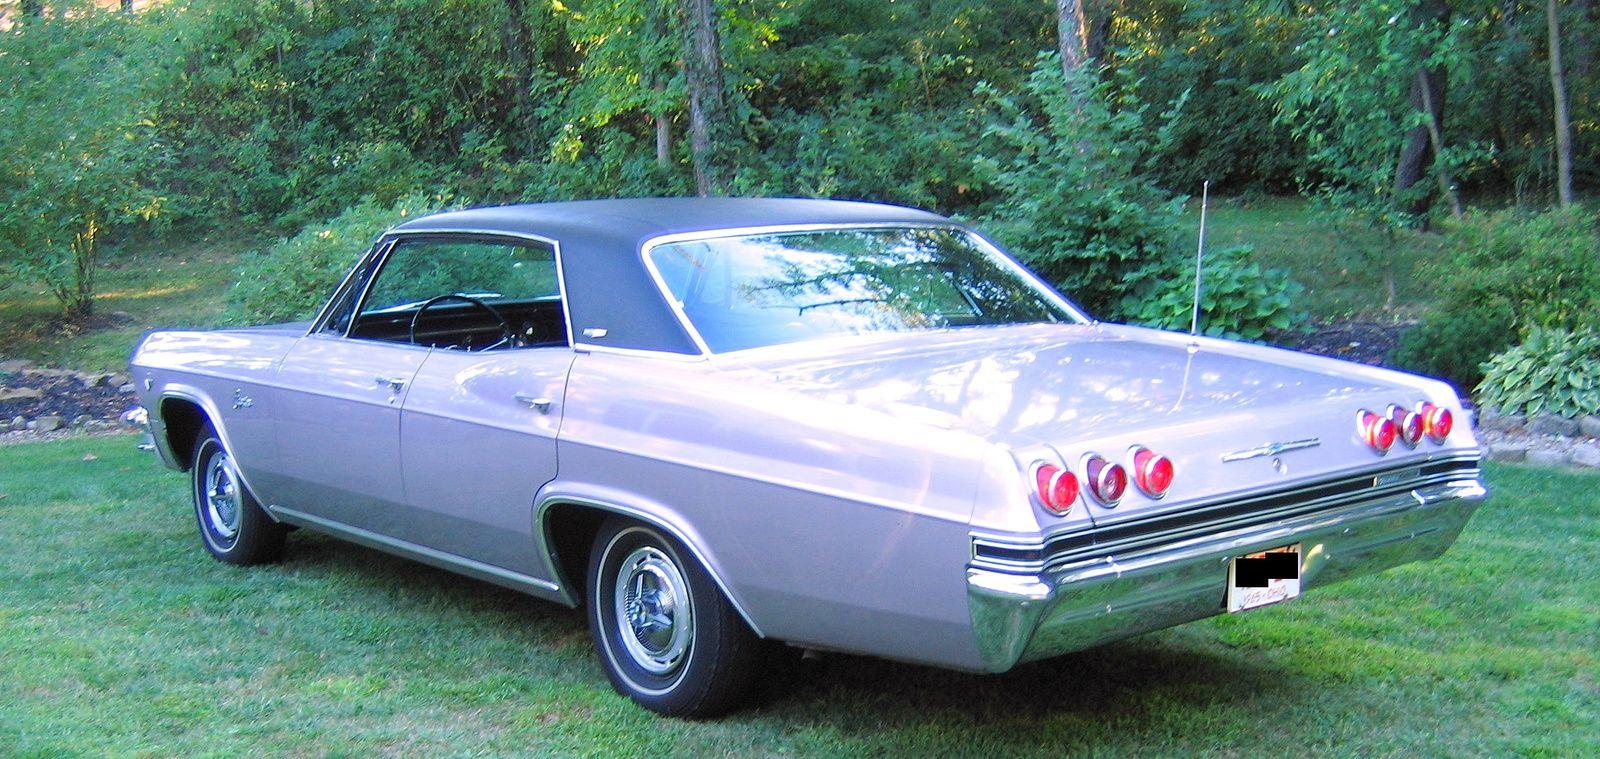 1965 Chevrolet Impala Caprice 4 Door Hardtop Sedan Chevrolet Impala Chevrolet Impala 1965 Classic Cars Trucks